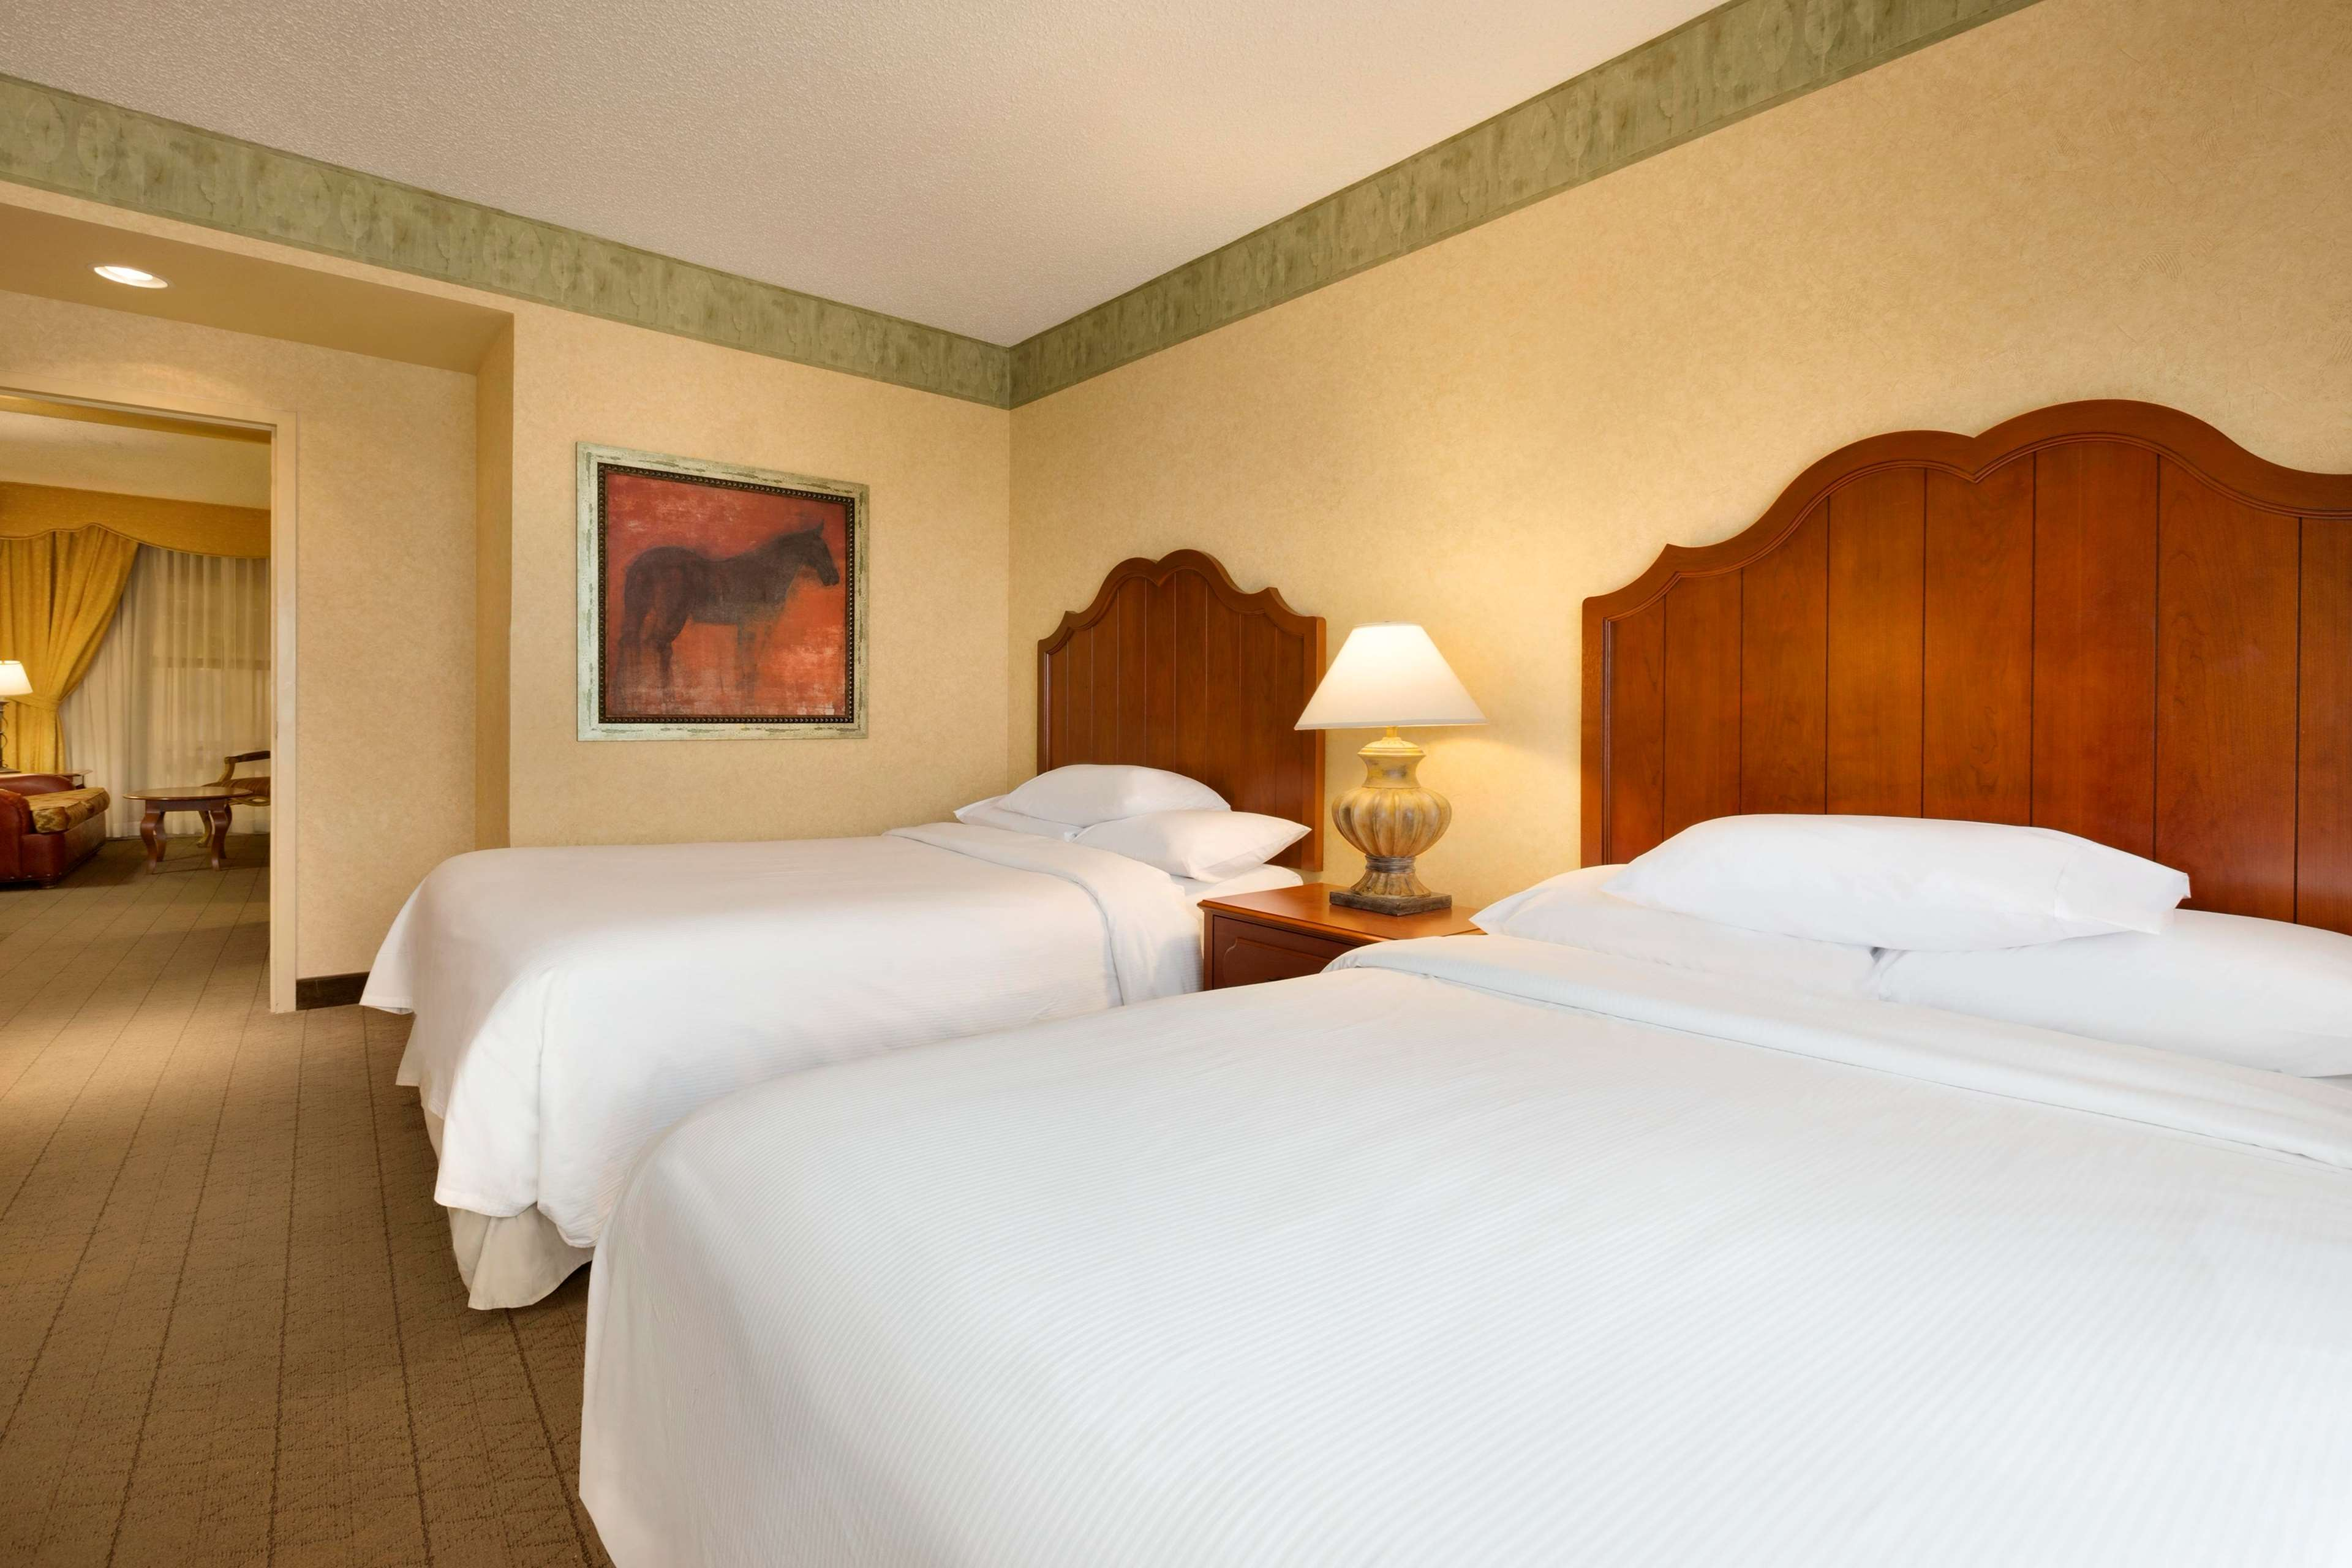 Embassy Suites by Hilton Albuquerque Hotel & Spa image 26